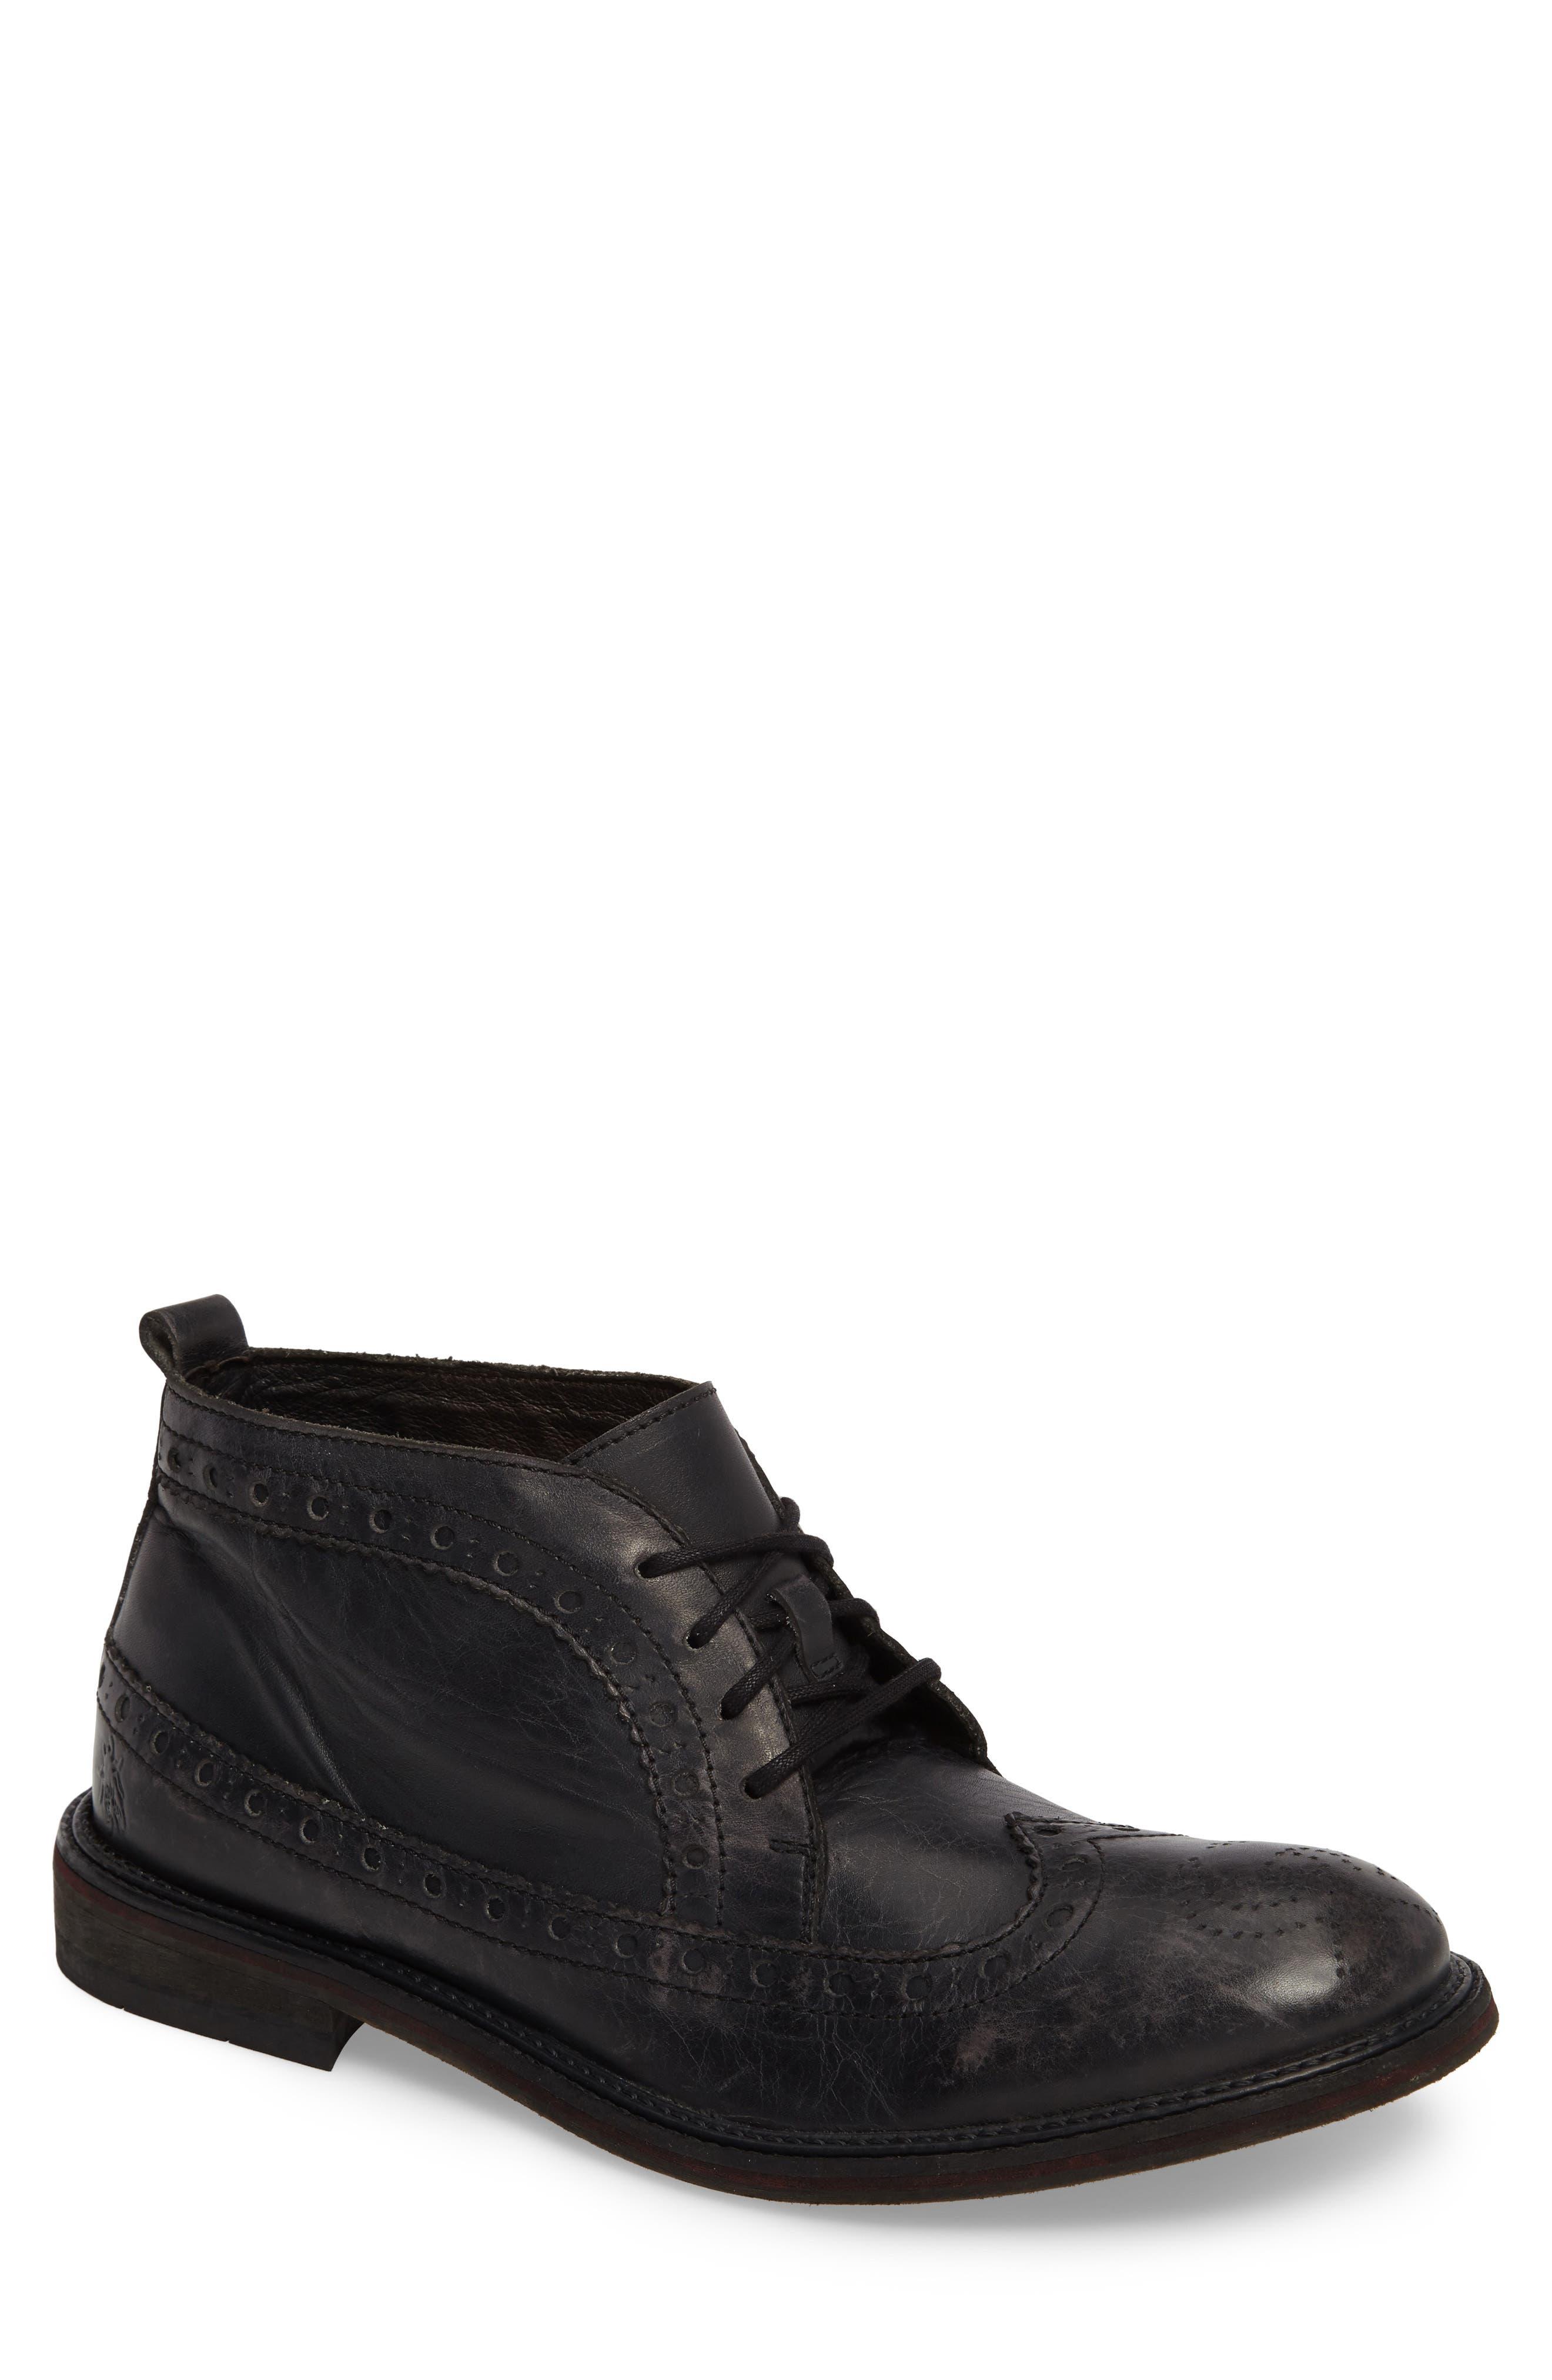 Wile Wingtip Chukka Boot,                         Main,                         color, Black